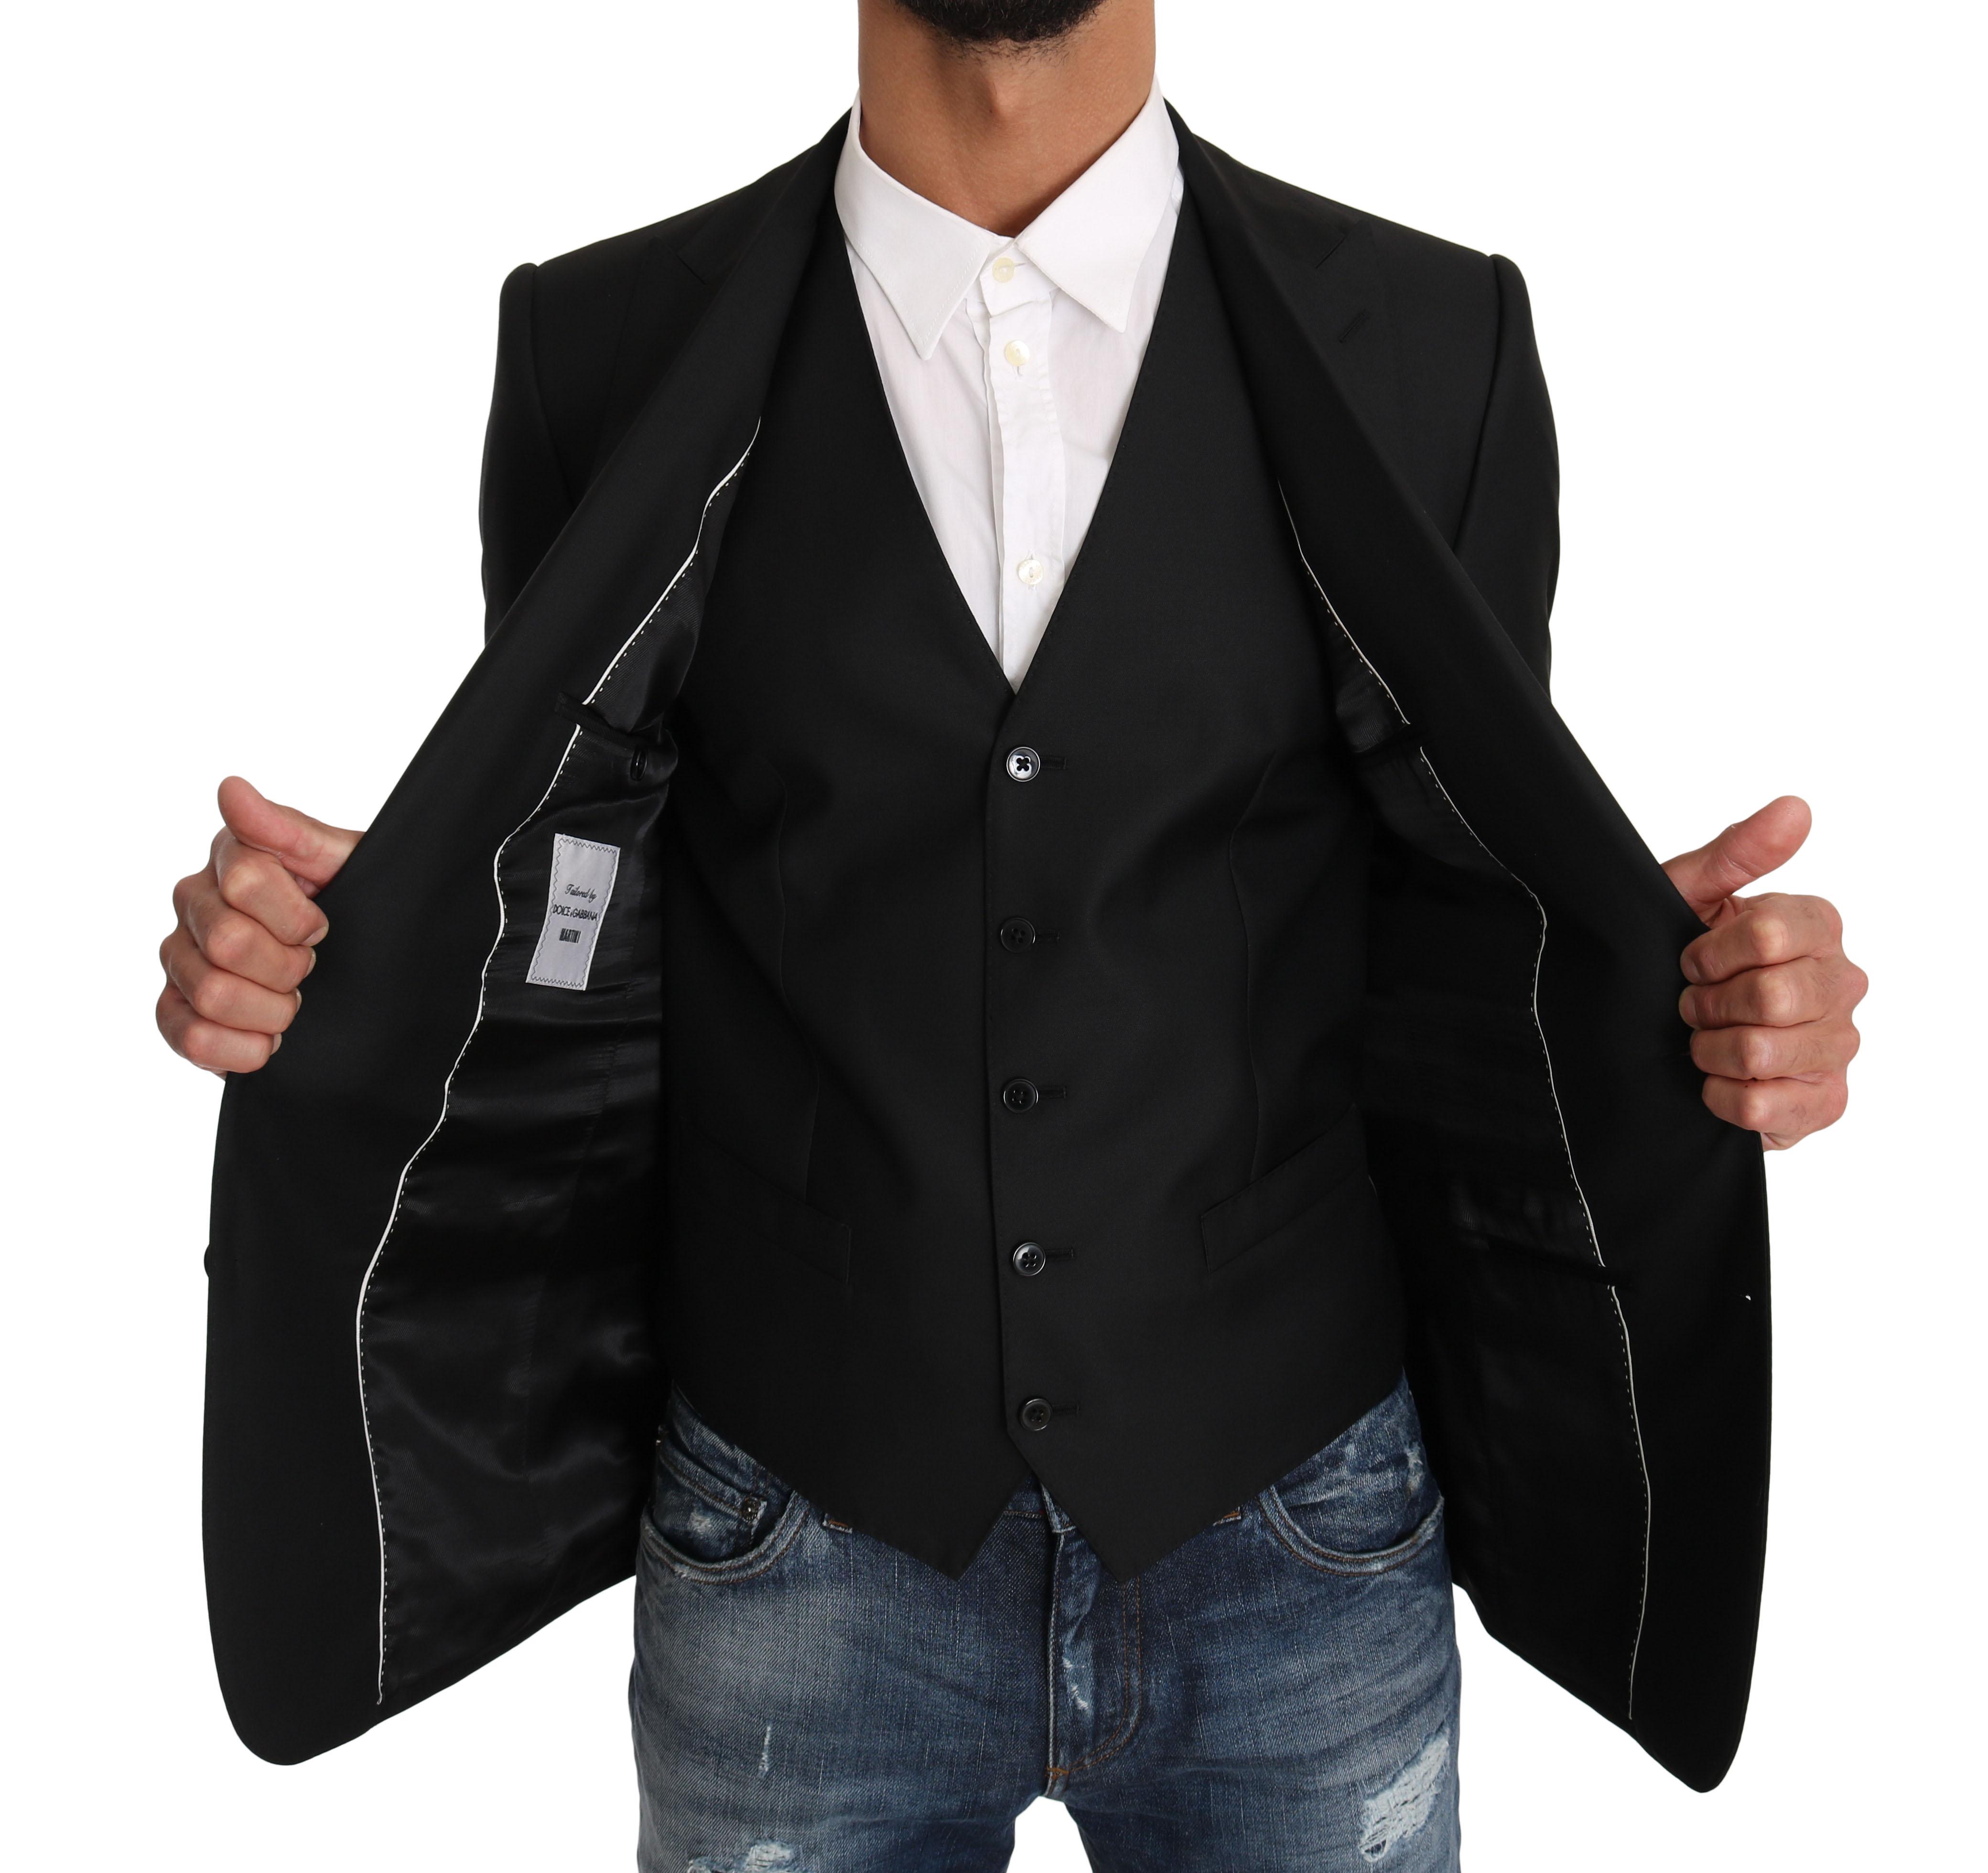 Dolce & Gabbana Men's Vest 2 Piece Wool MARTINI Blazer Black KOS1197 - IT46 | S